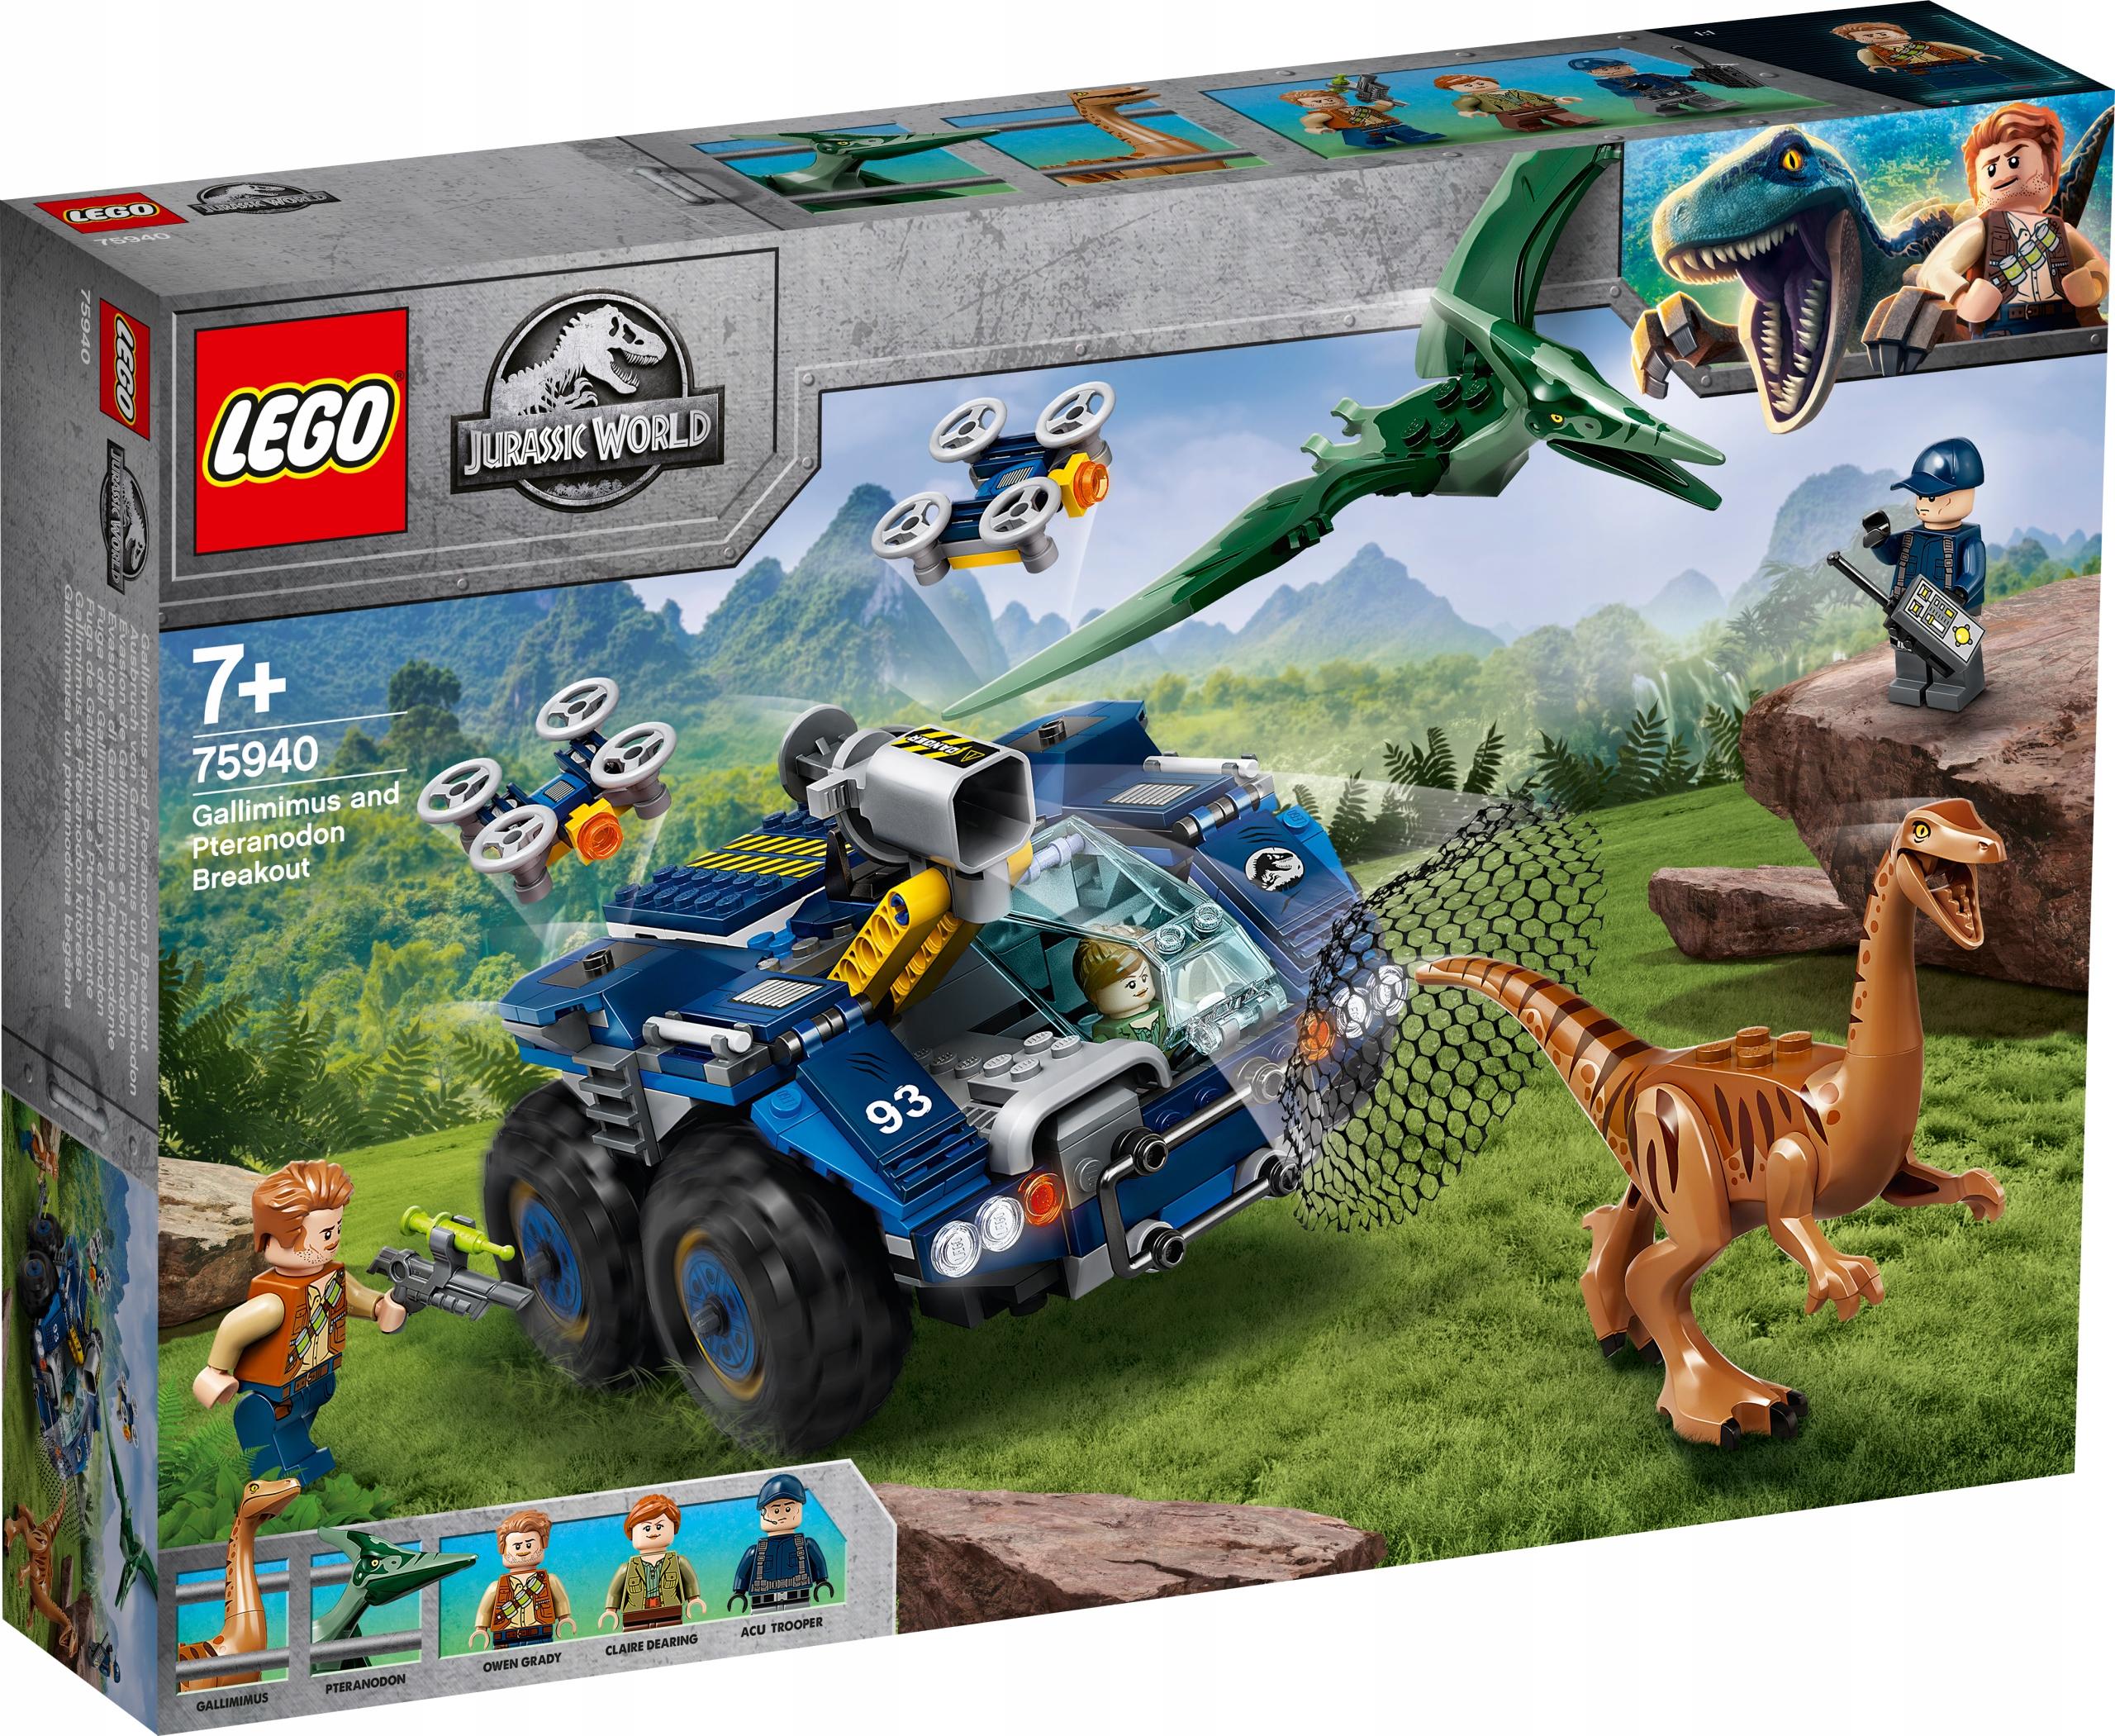 LEGO JURASSIC WORLD Gallimim i pteranodon 75940